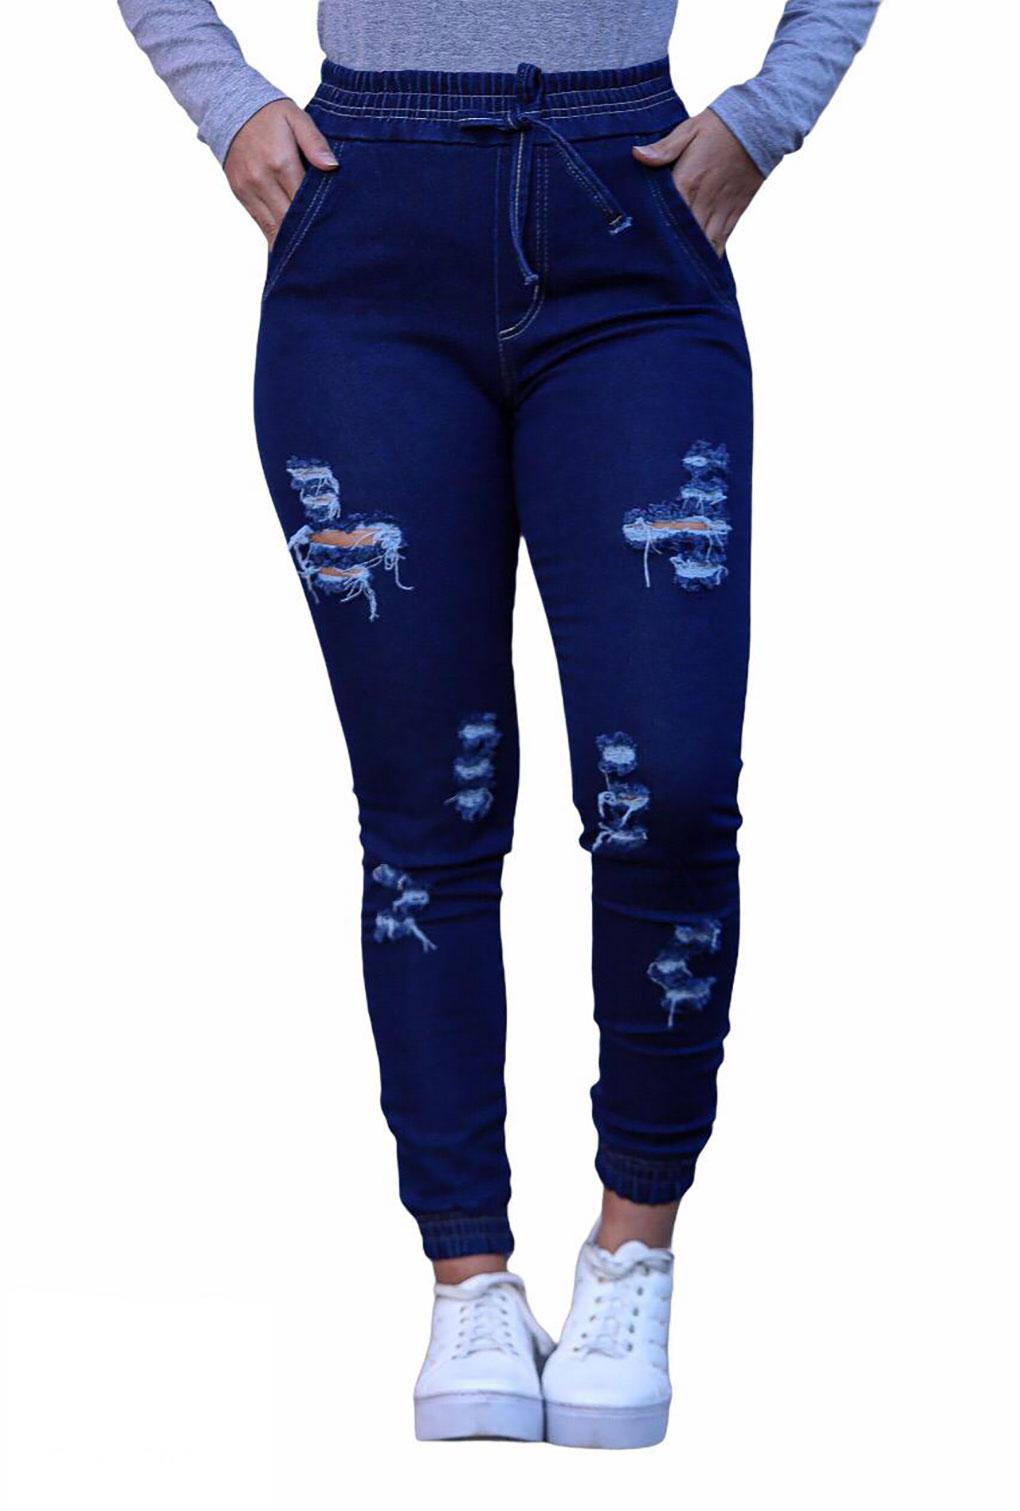 Calça Jeans Feminina Jogger Destroyed Cintura Alta Blogueira  - ModaStore | Moda Feminina